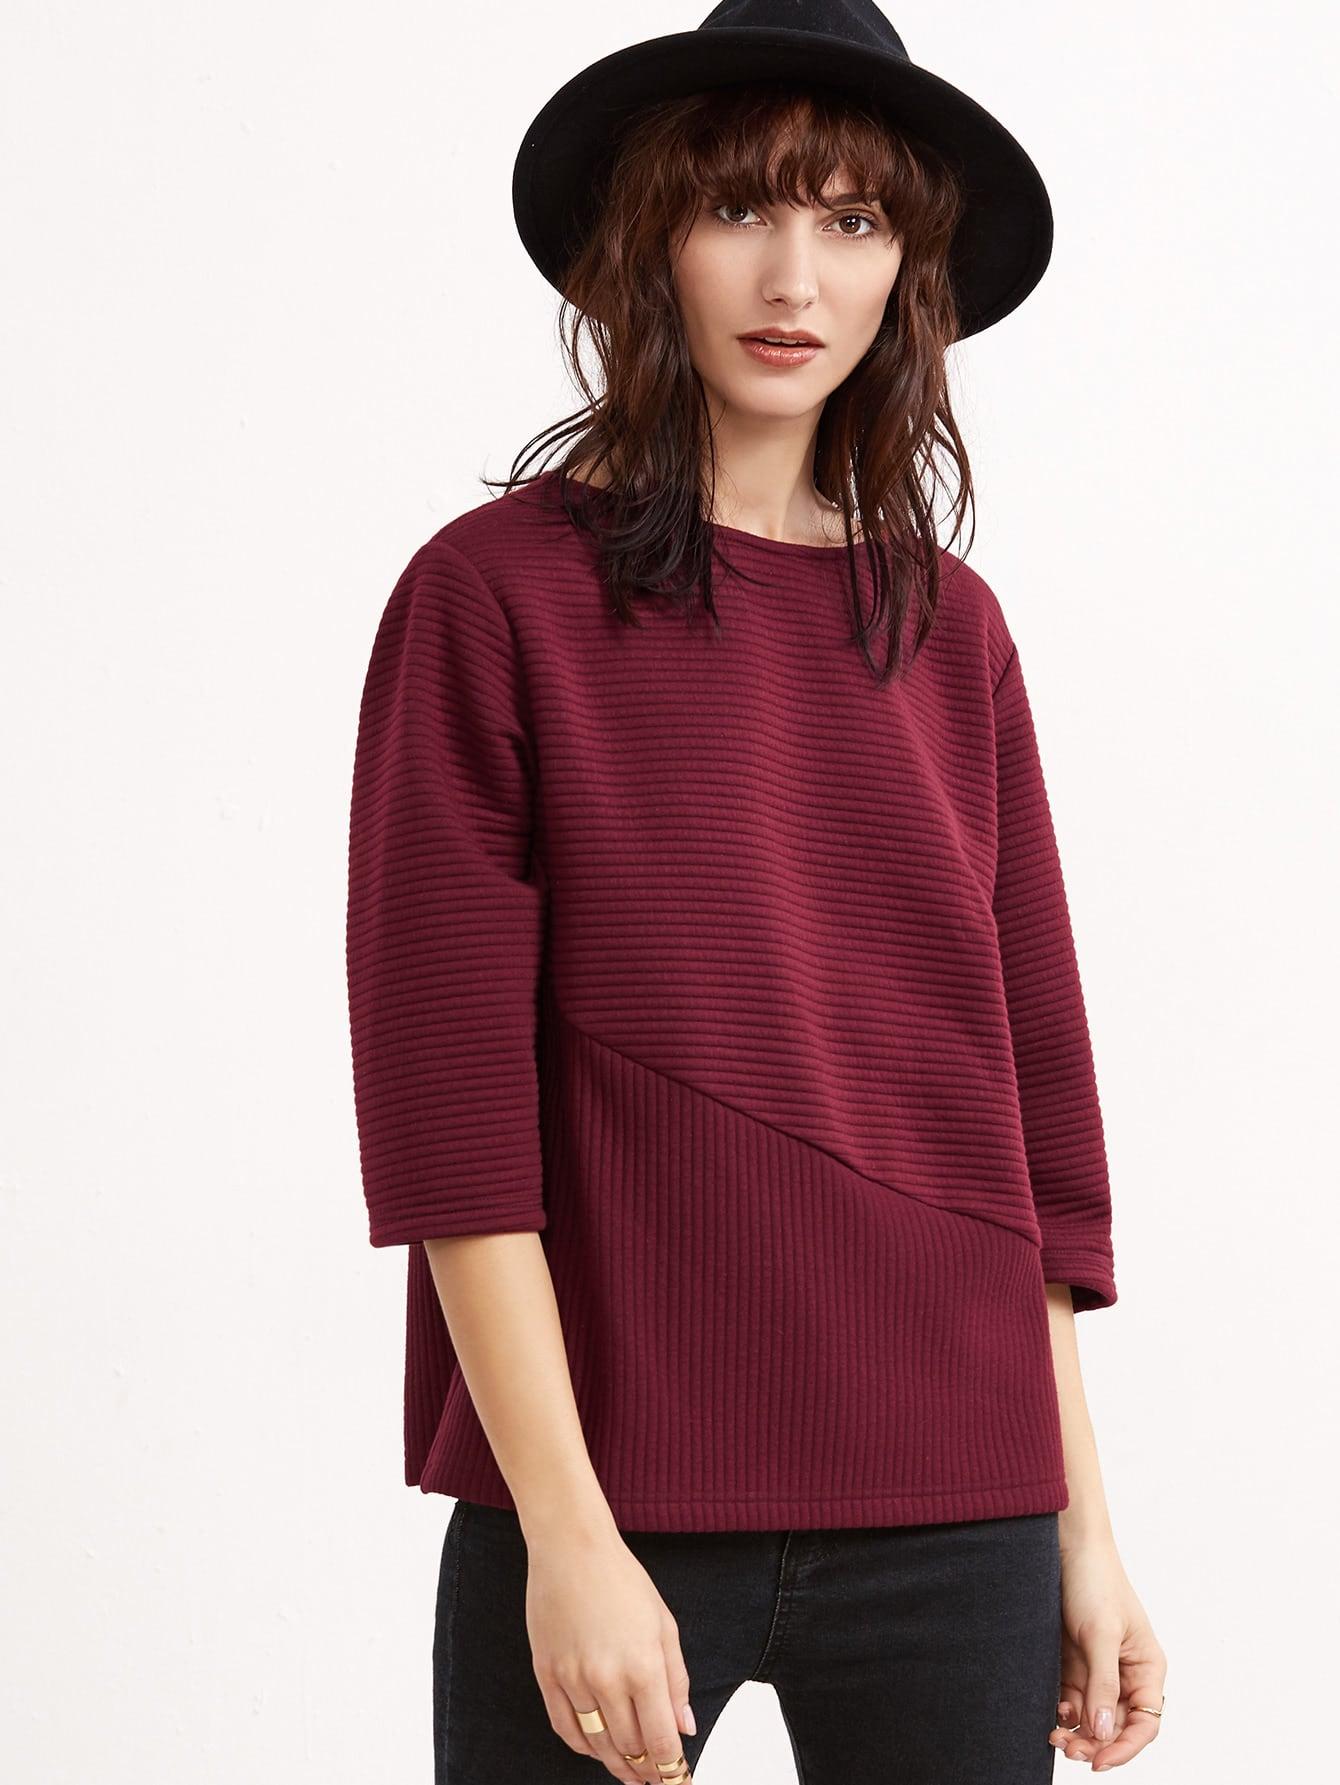 Burgundy 3/4 Sleeve Cut And Sew Ribbed Sweatshirt sweatshirt161129703